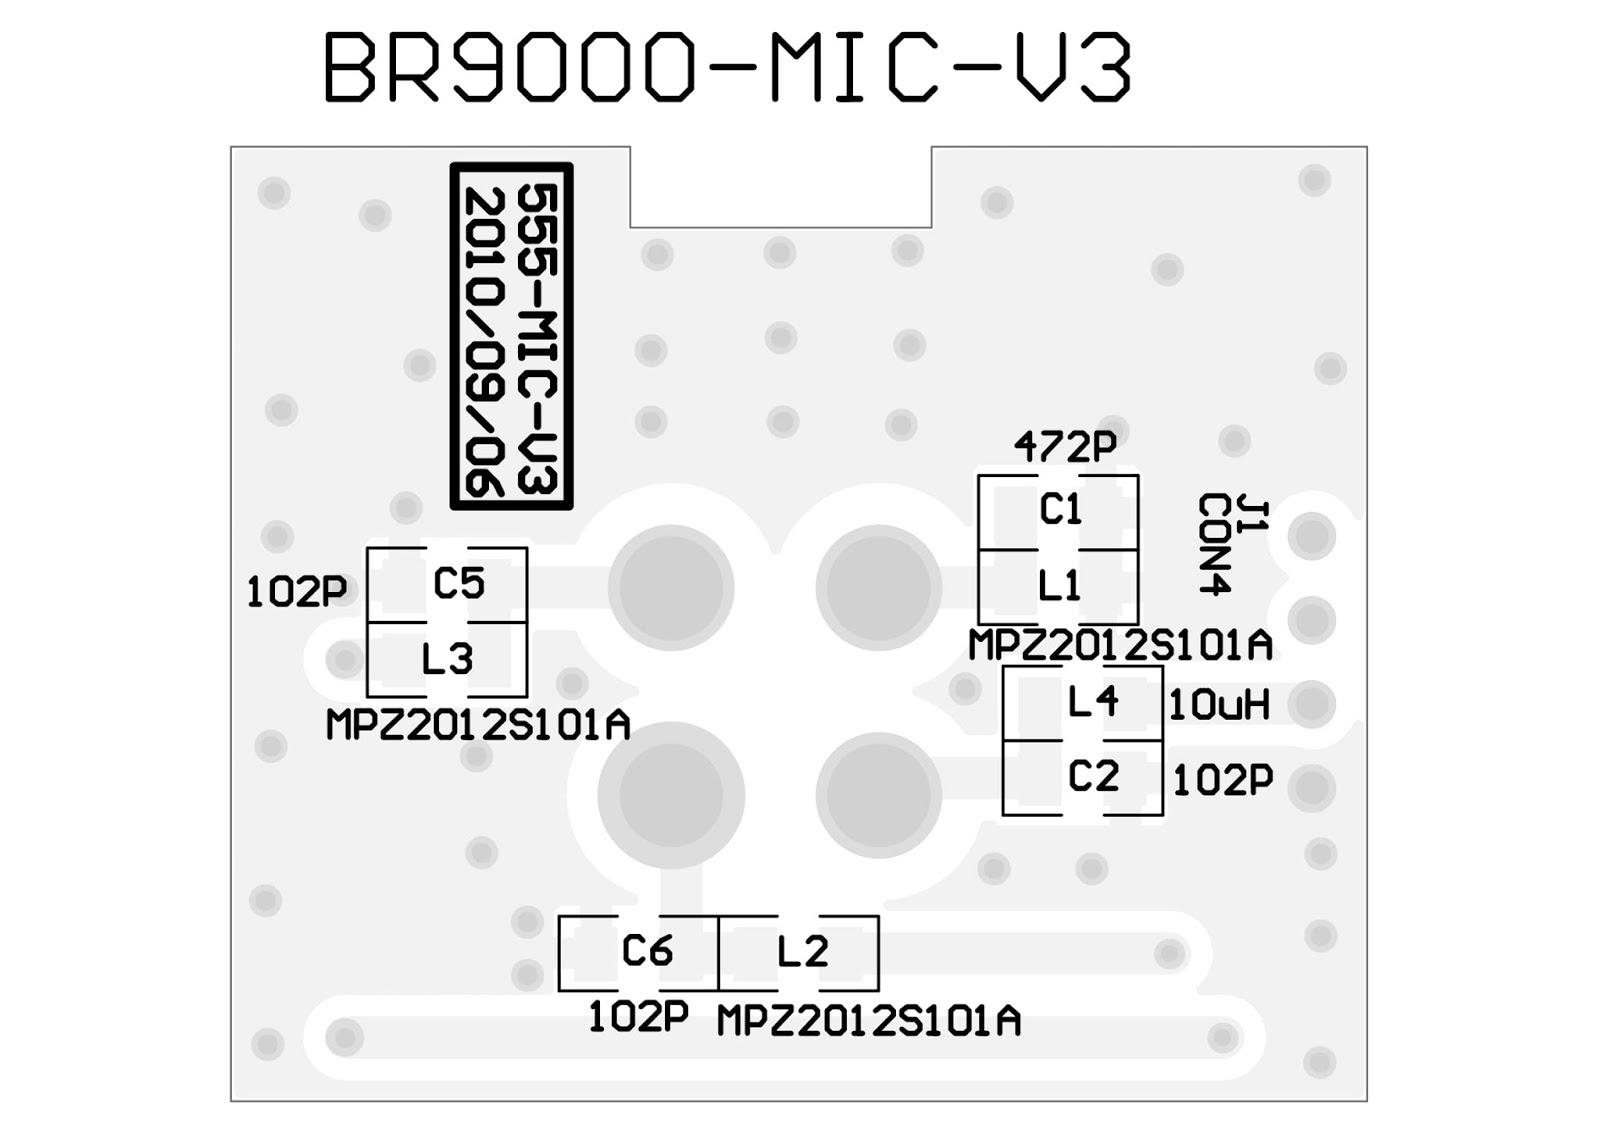 L I C O T E L E C O M : Manual de Serviço Hannover BR9000